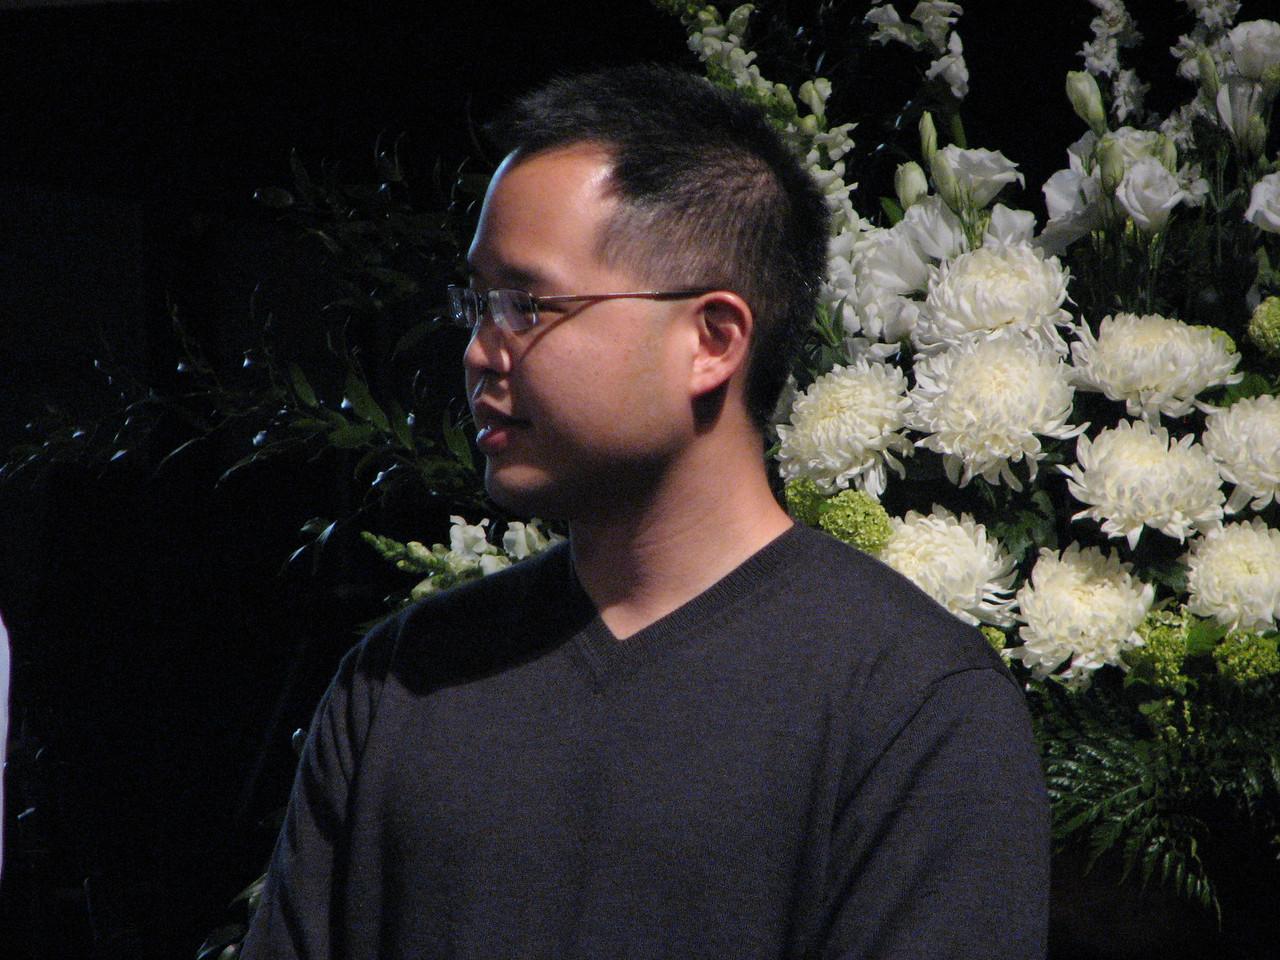 2007 05 18 Fri - Rehearsal - Groomsman Jeff Lin